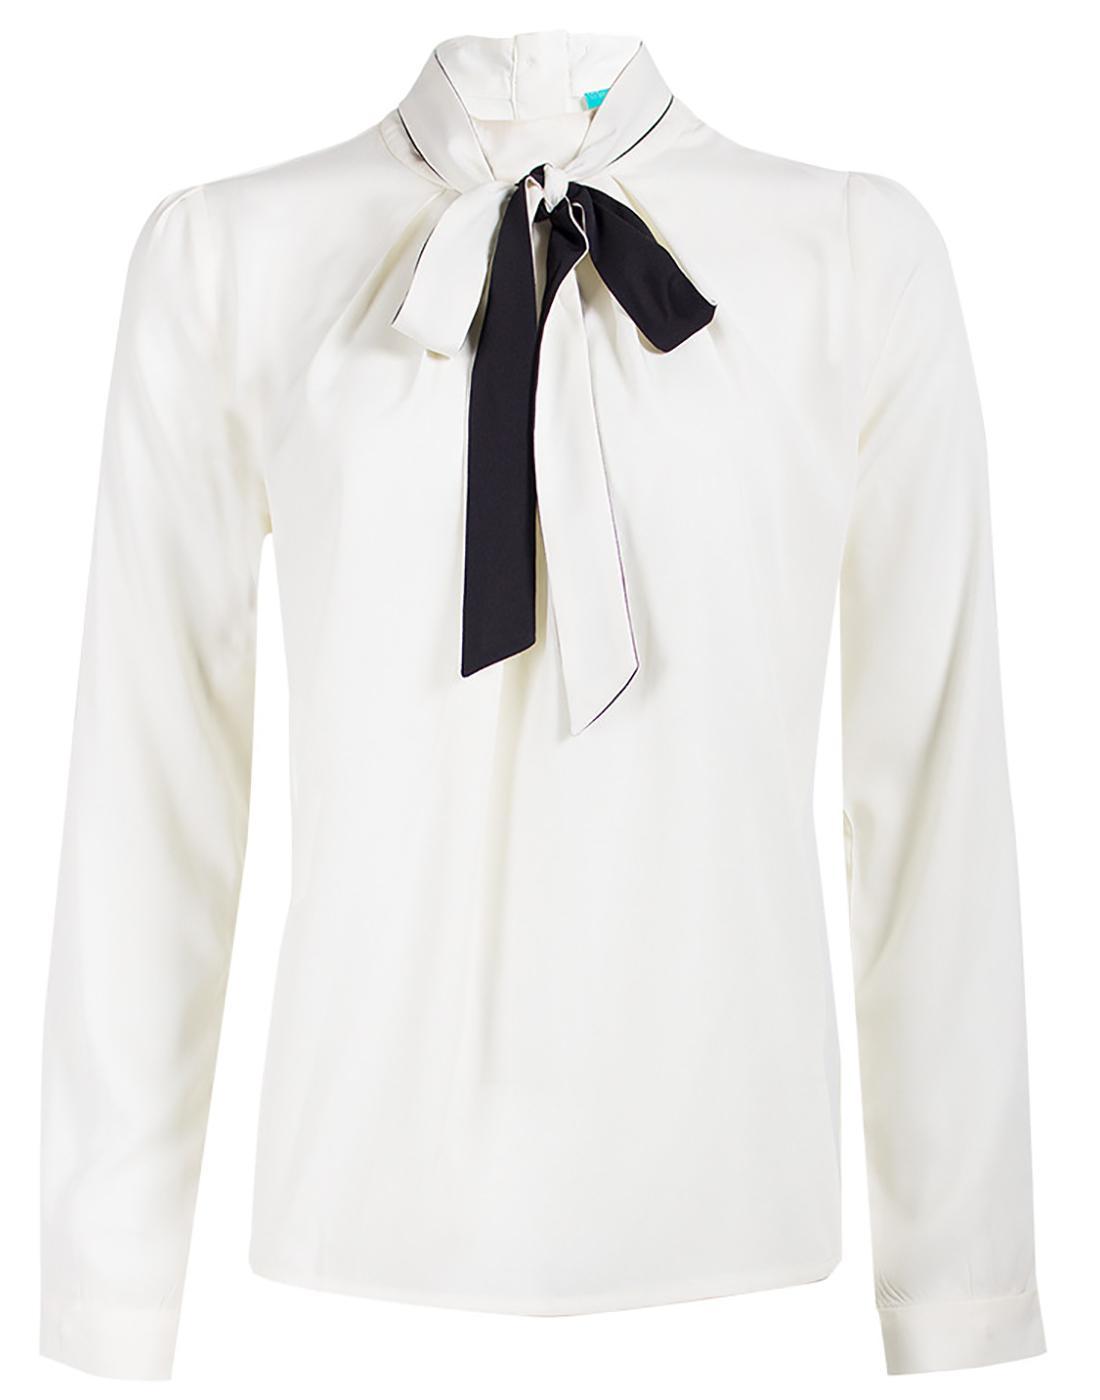 Pippa FEVER Retro Vintage Bow Collar Shirt - Cream